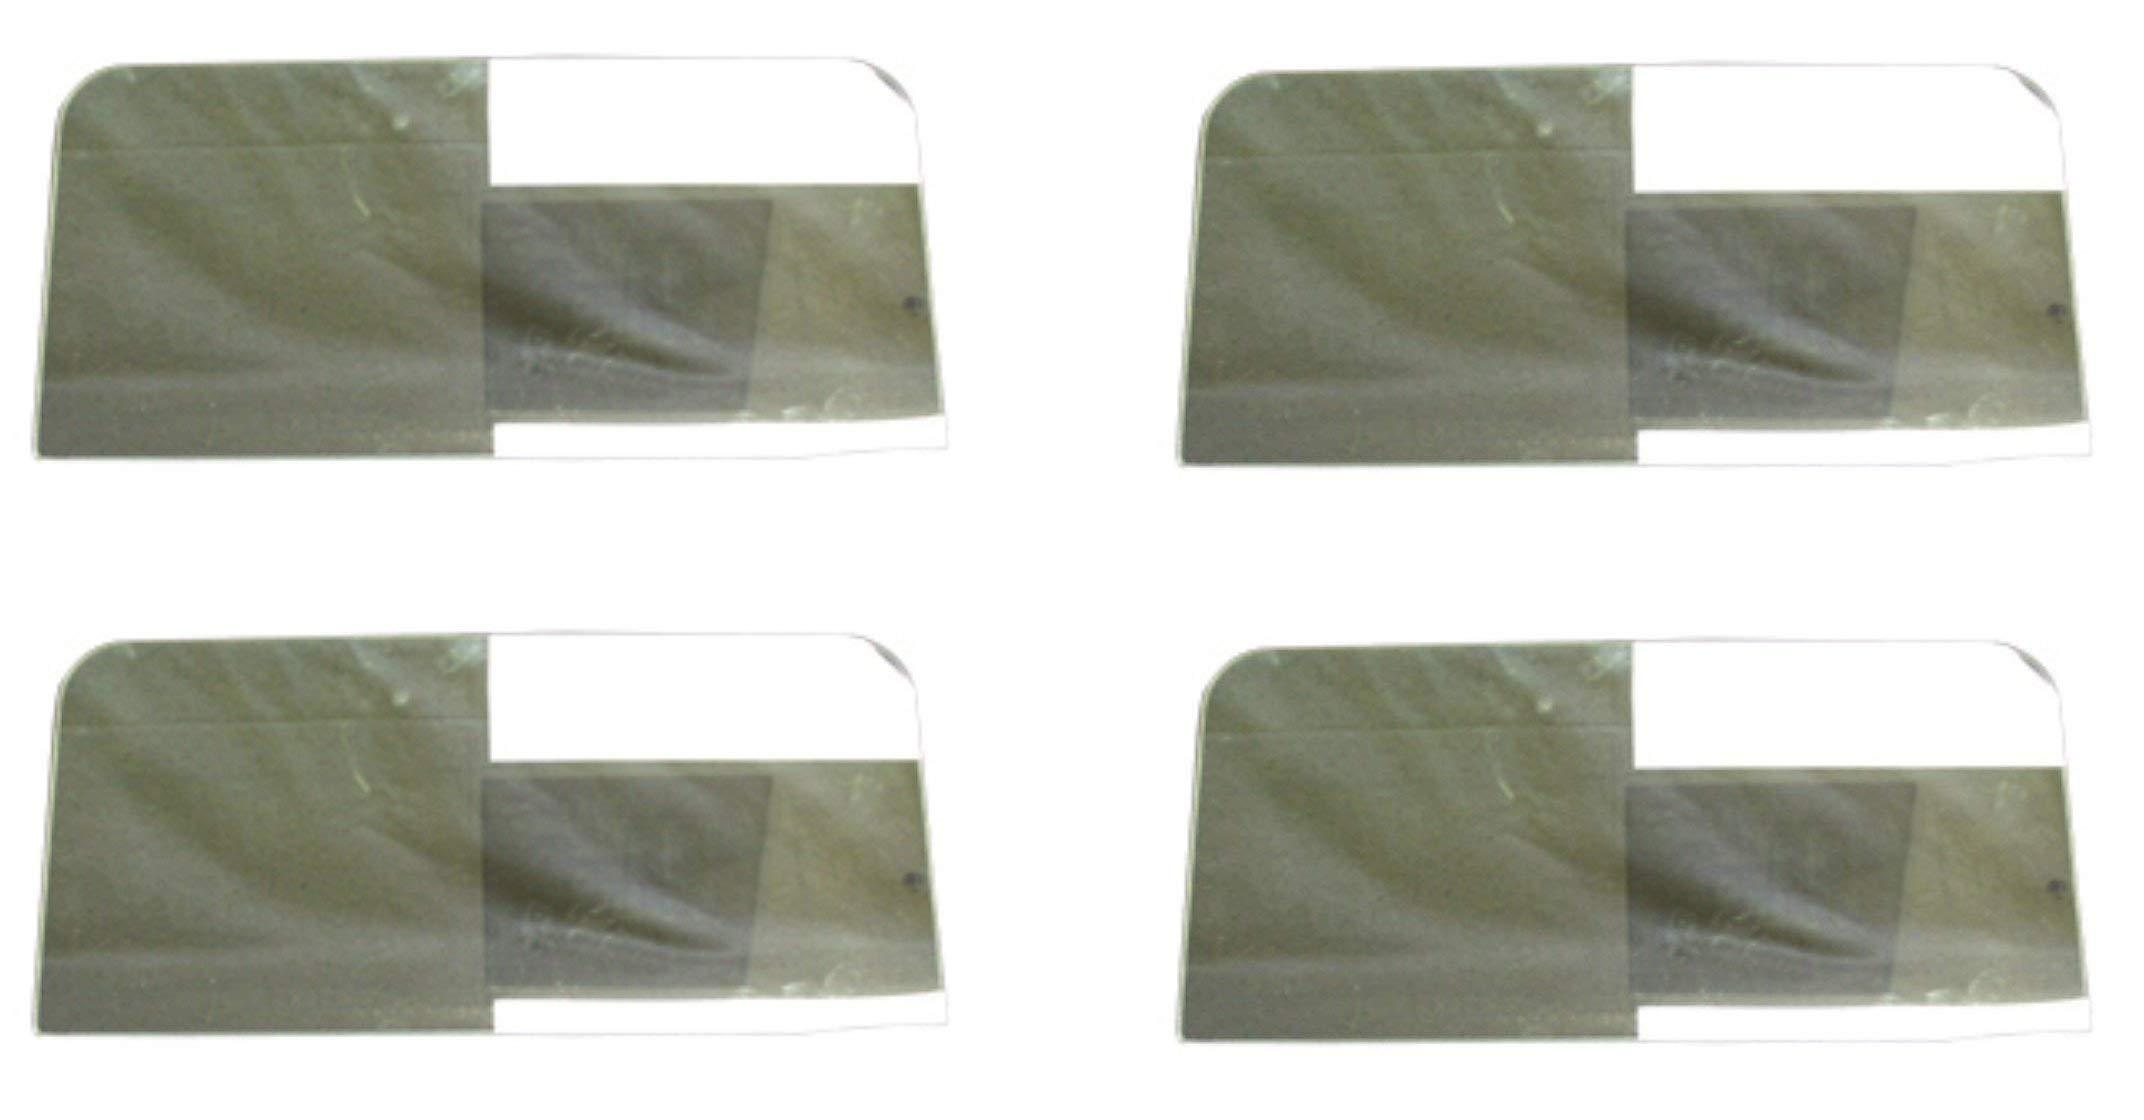 NORCOLD INC. Refrigerators 618158 Crisper Cover Glass Shelf (4)